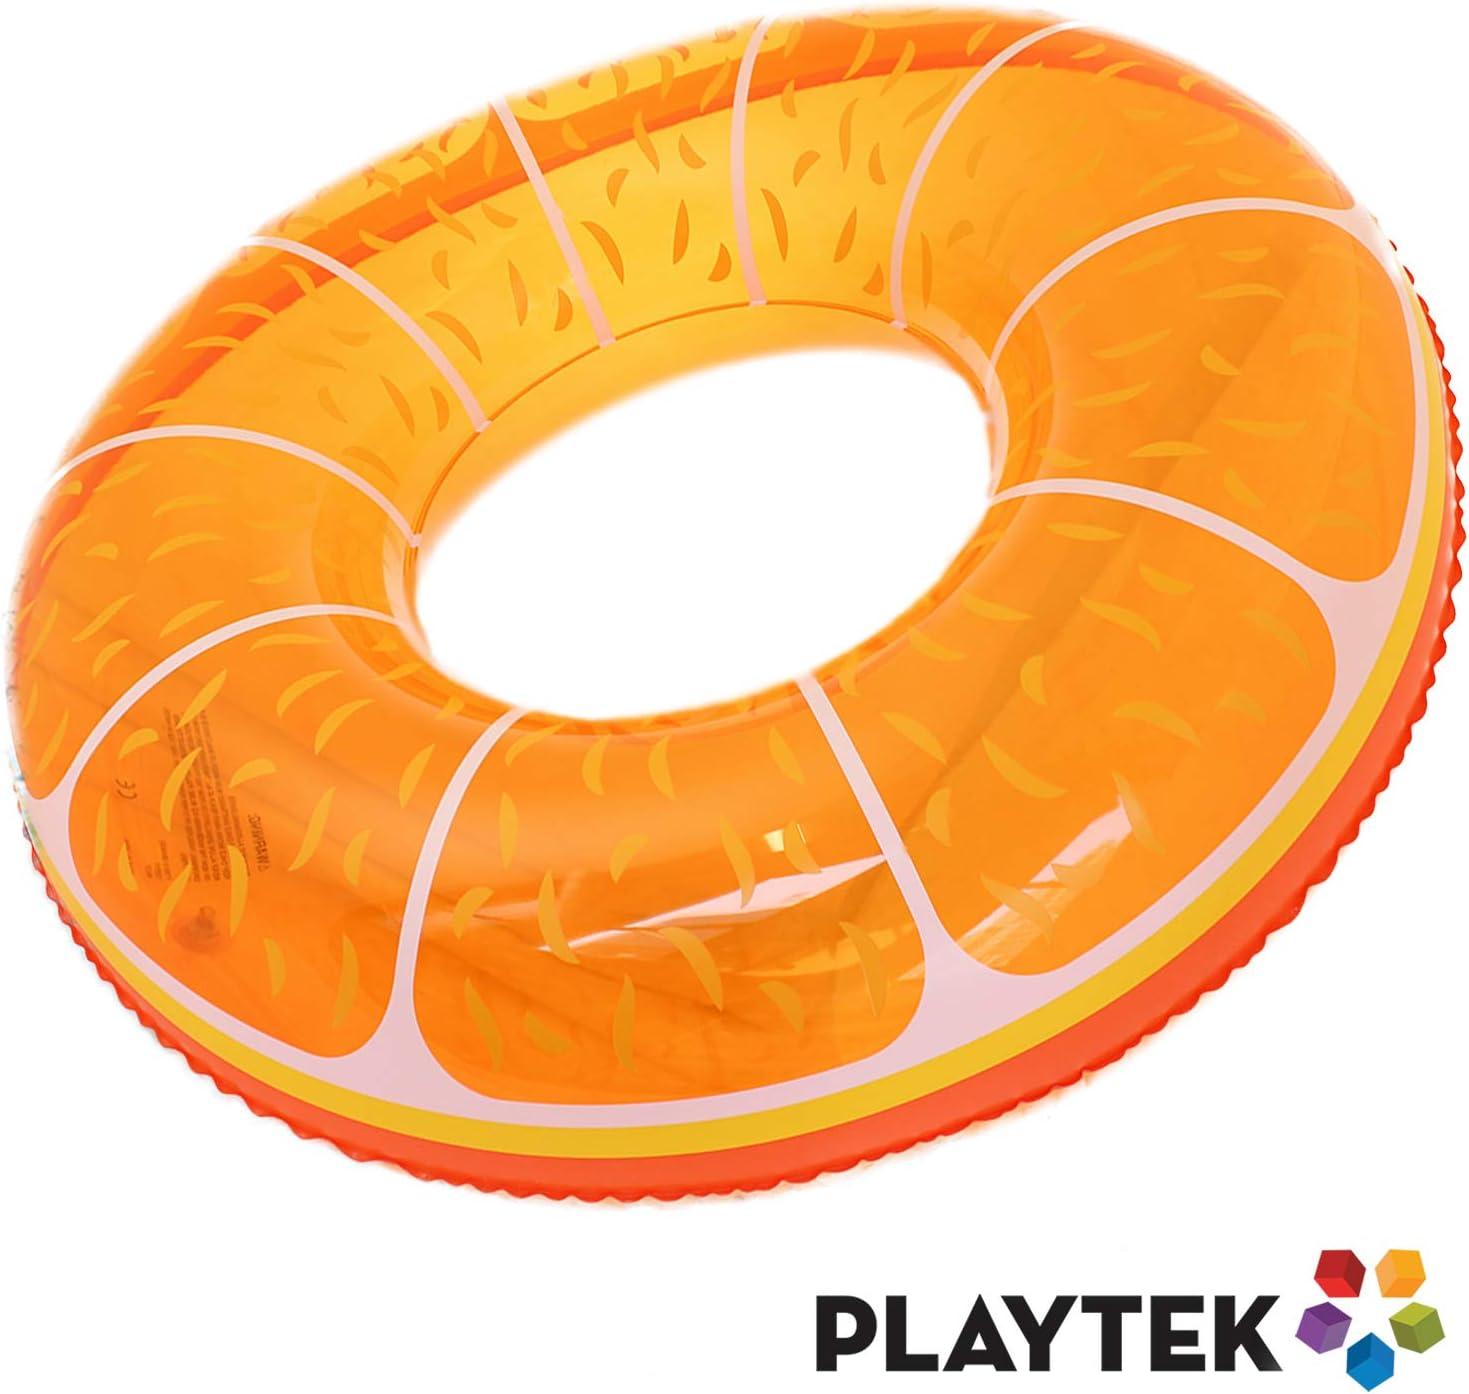 Playtek Toys Tropical Floral Print Tube Inflatable Pool Float